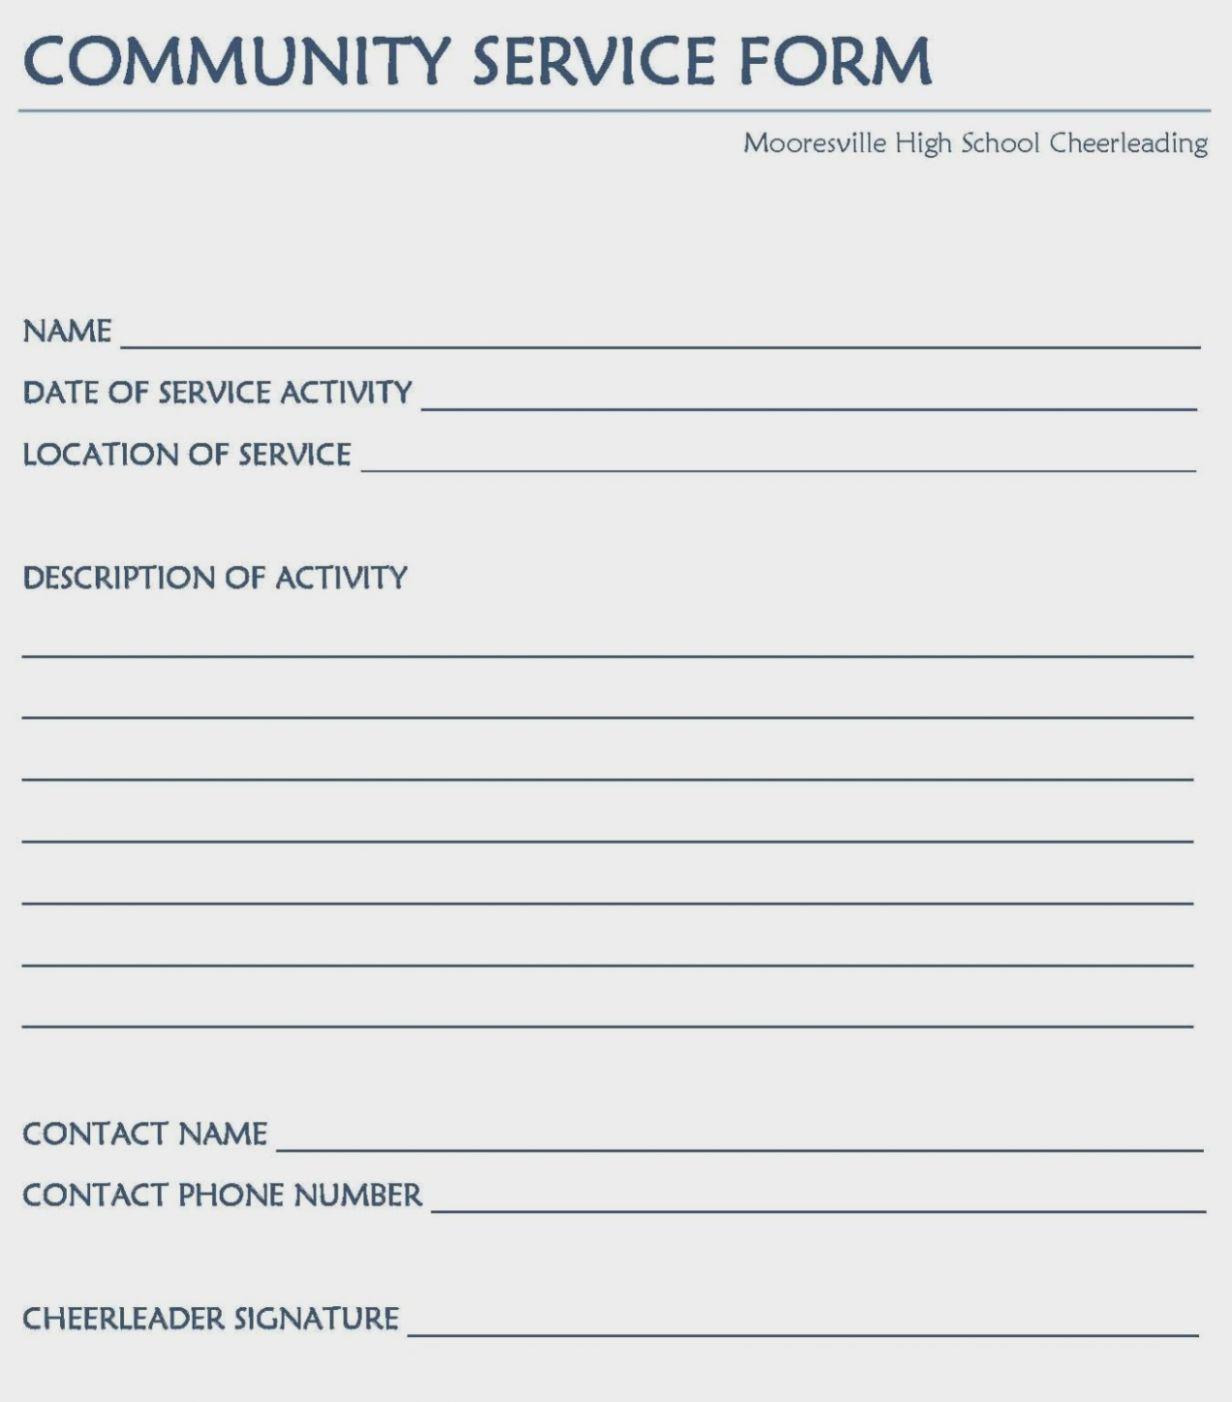 Essay on community service in high school